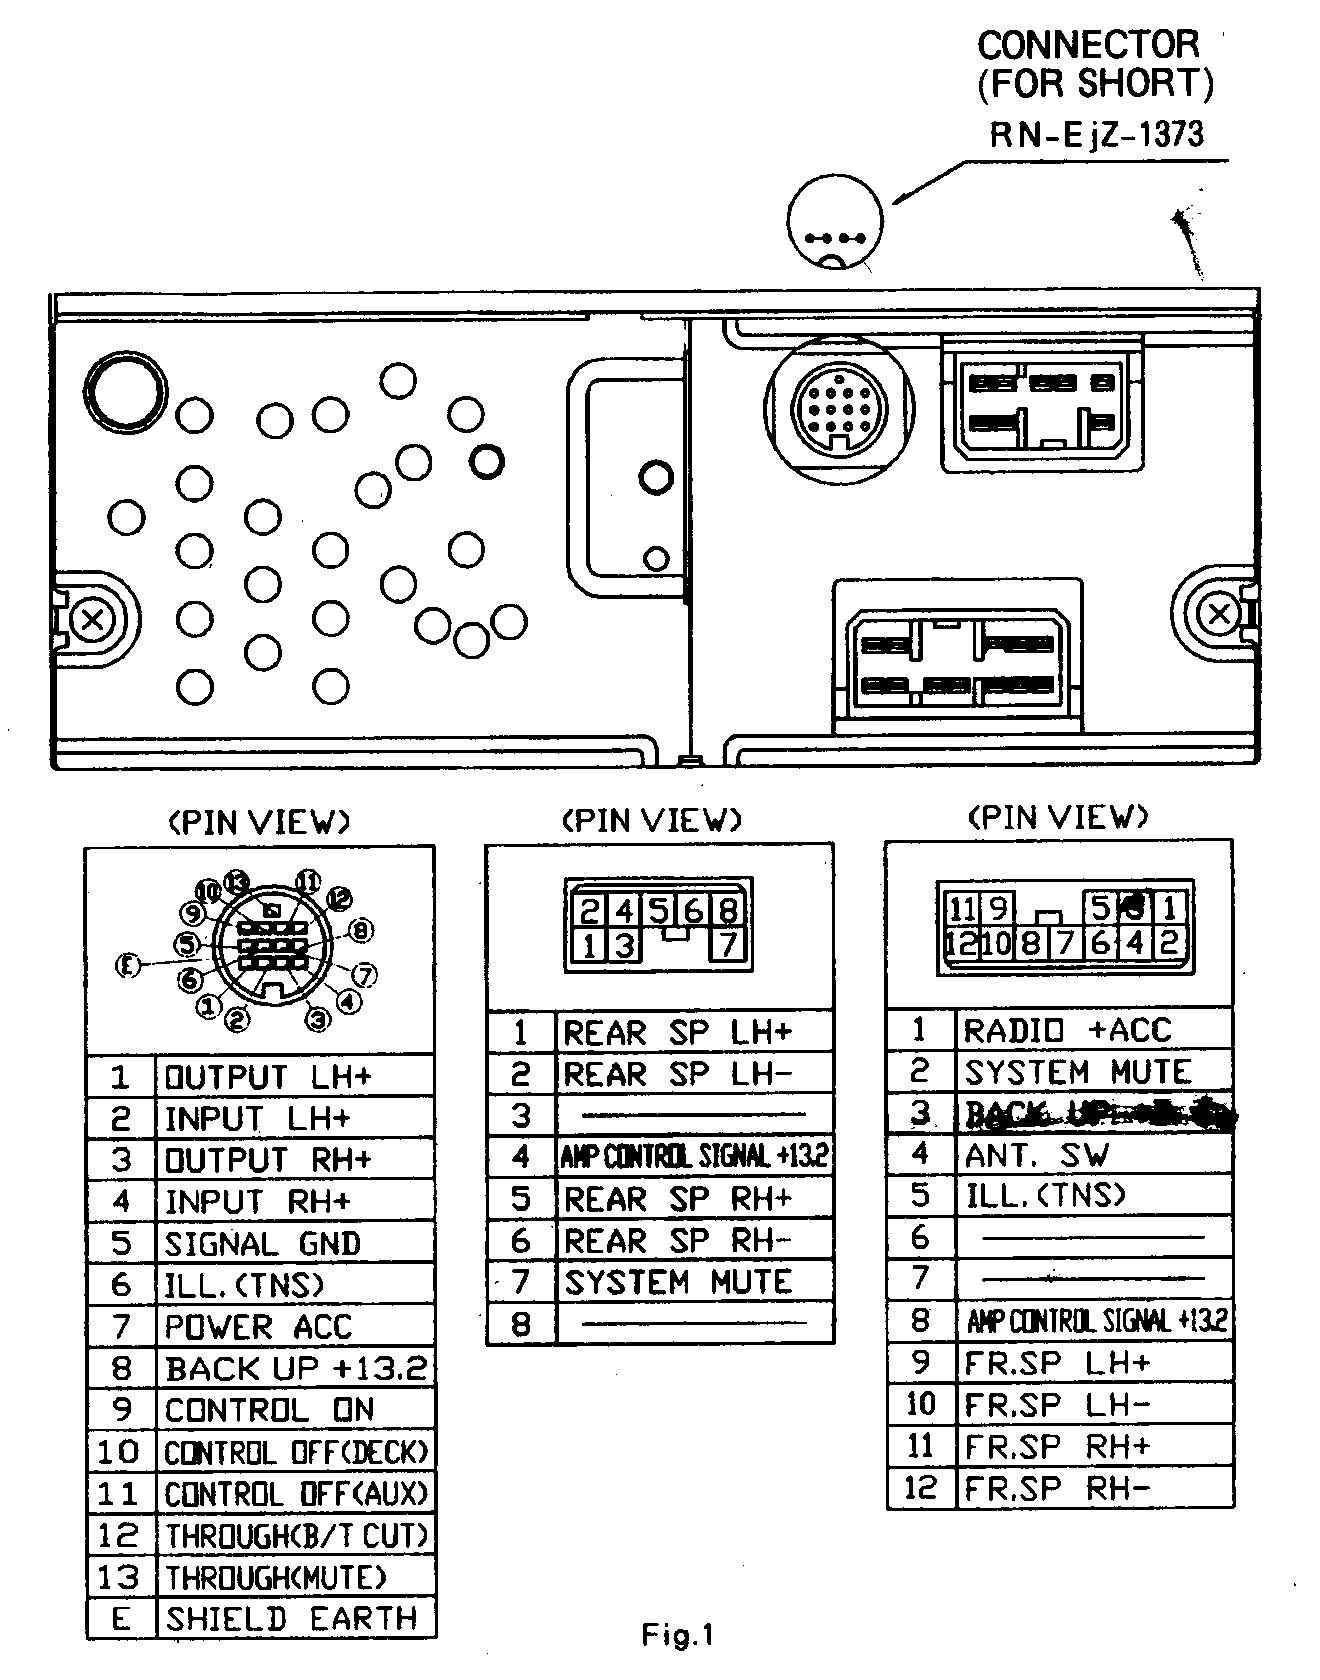 WireHarnessMazda121001?resize=665%2C846 nissan micra k11 stereo wiring diagram wiring diagram nissan micra k11 stereo wiring diagram at alyssarenee.co